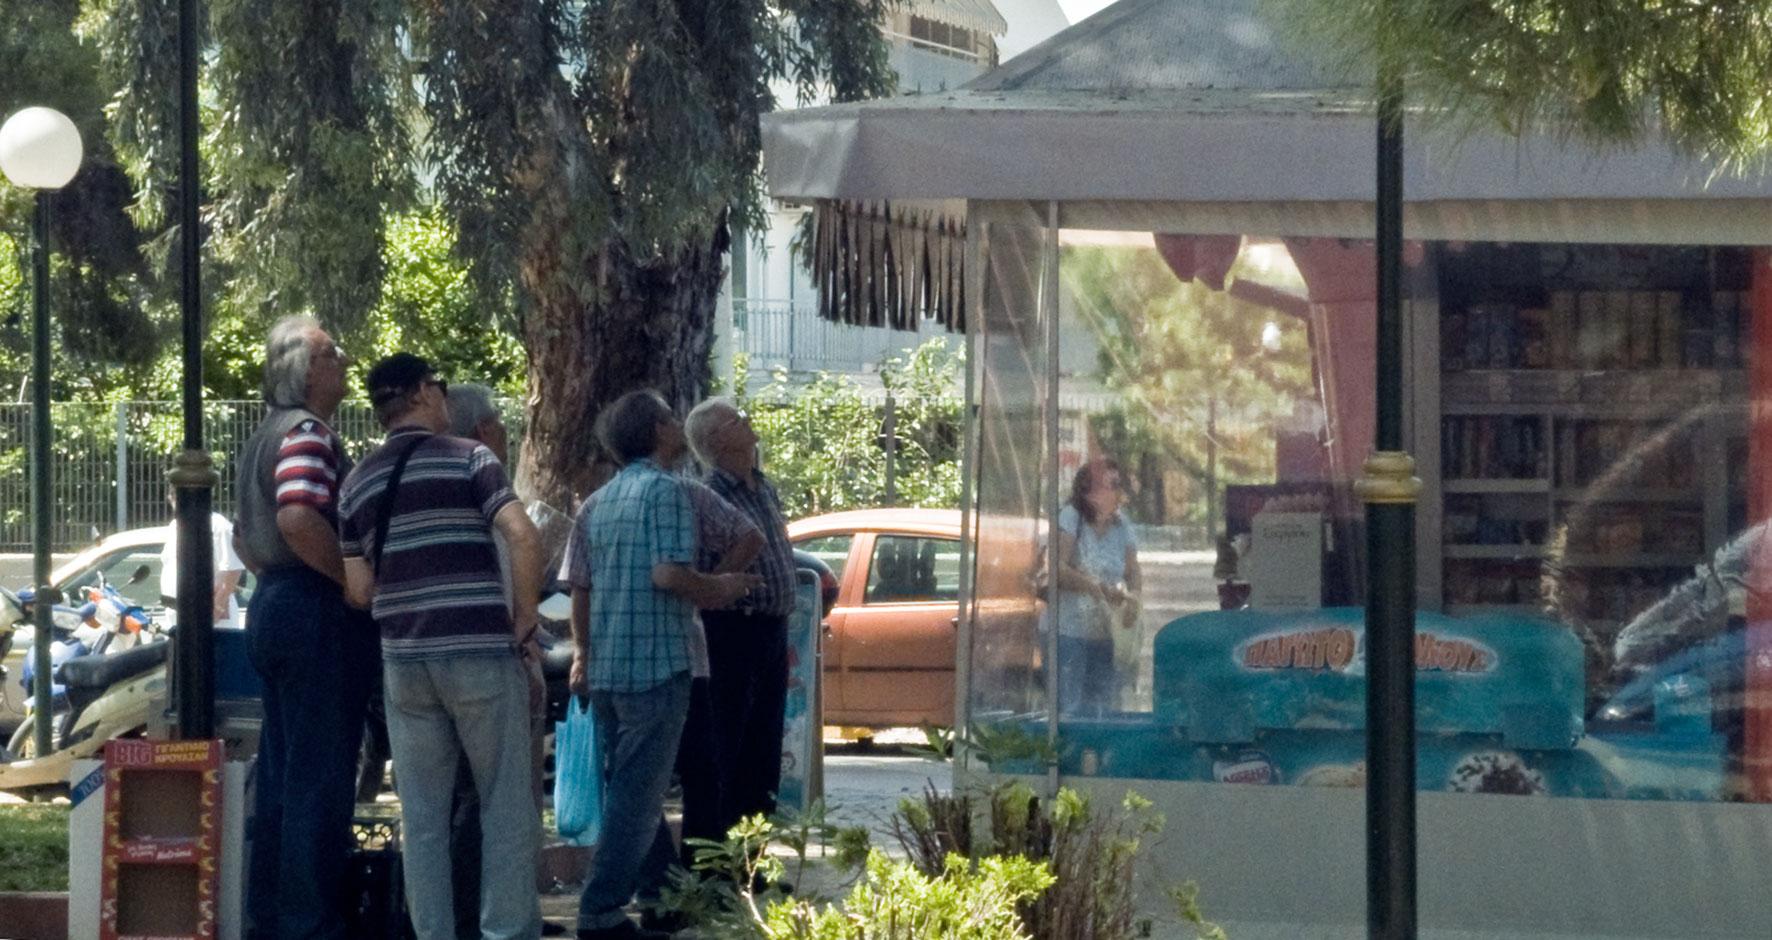 DAPHNÉ KERAMIDAS: ATHENIANS